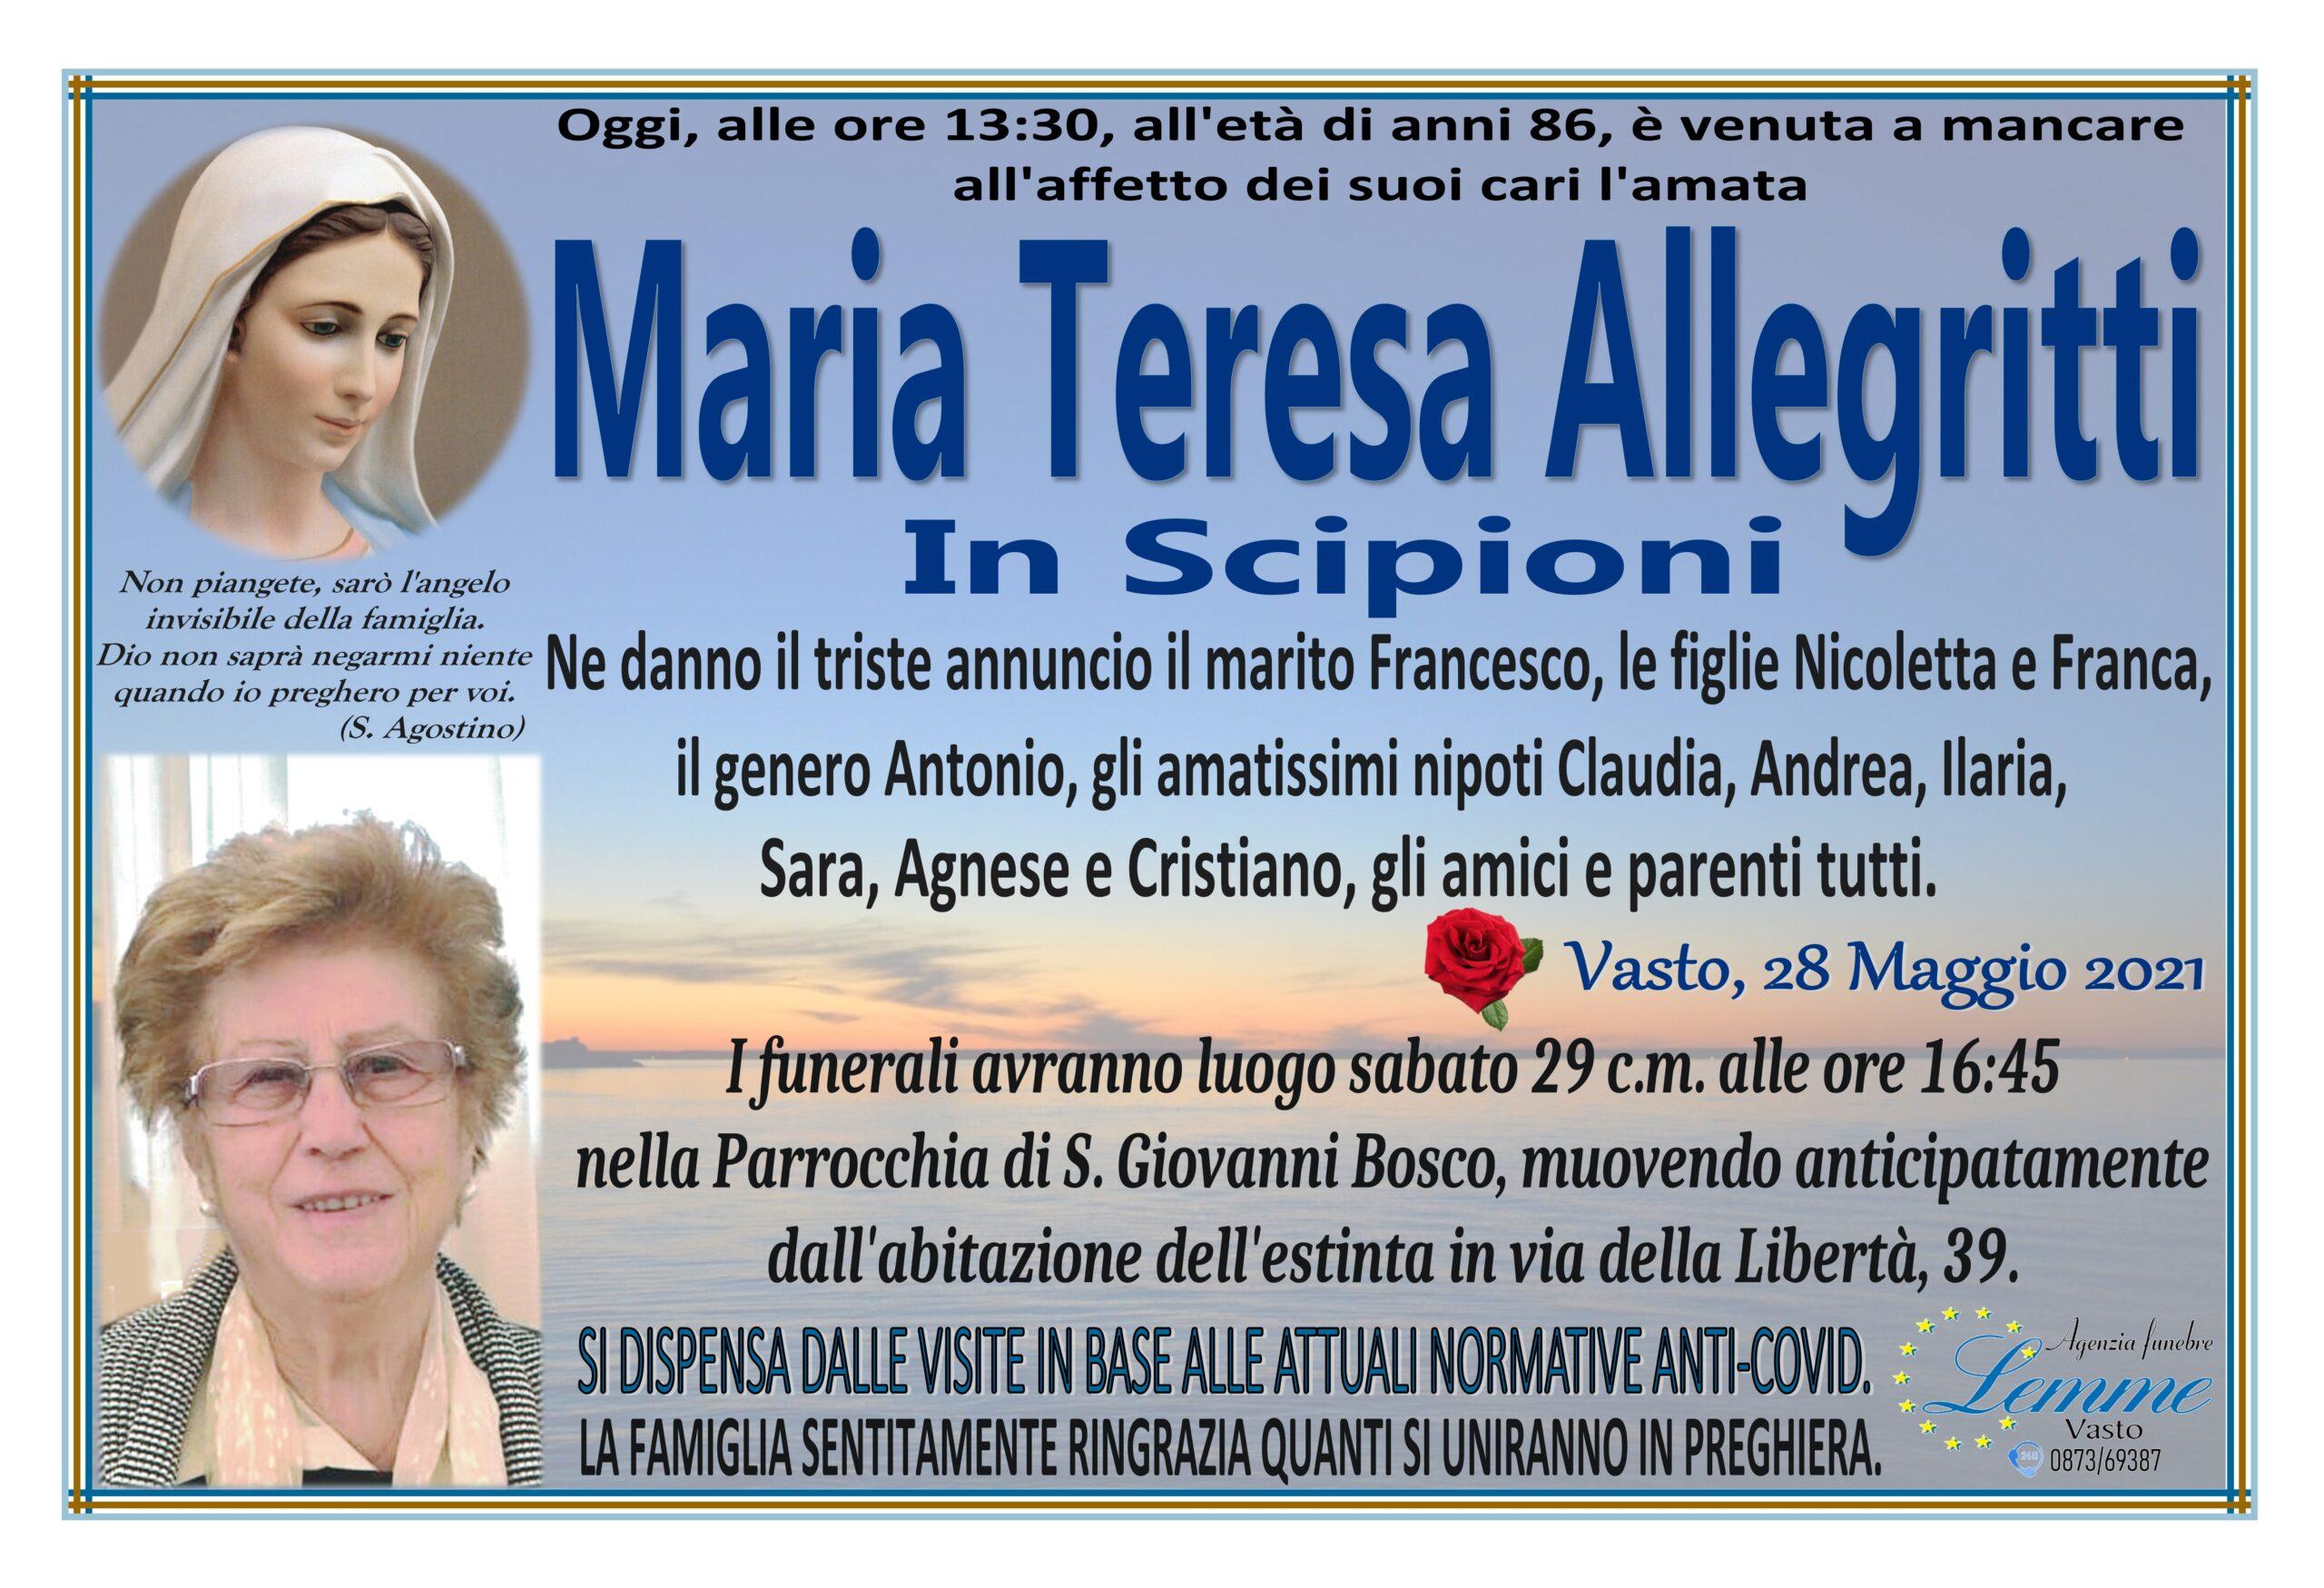 MARIA TERESA ALLEGRITTI